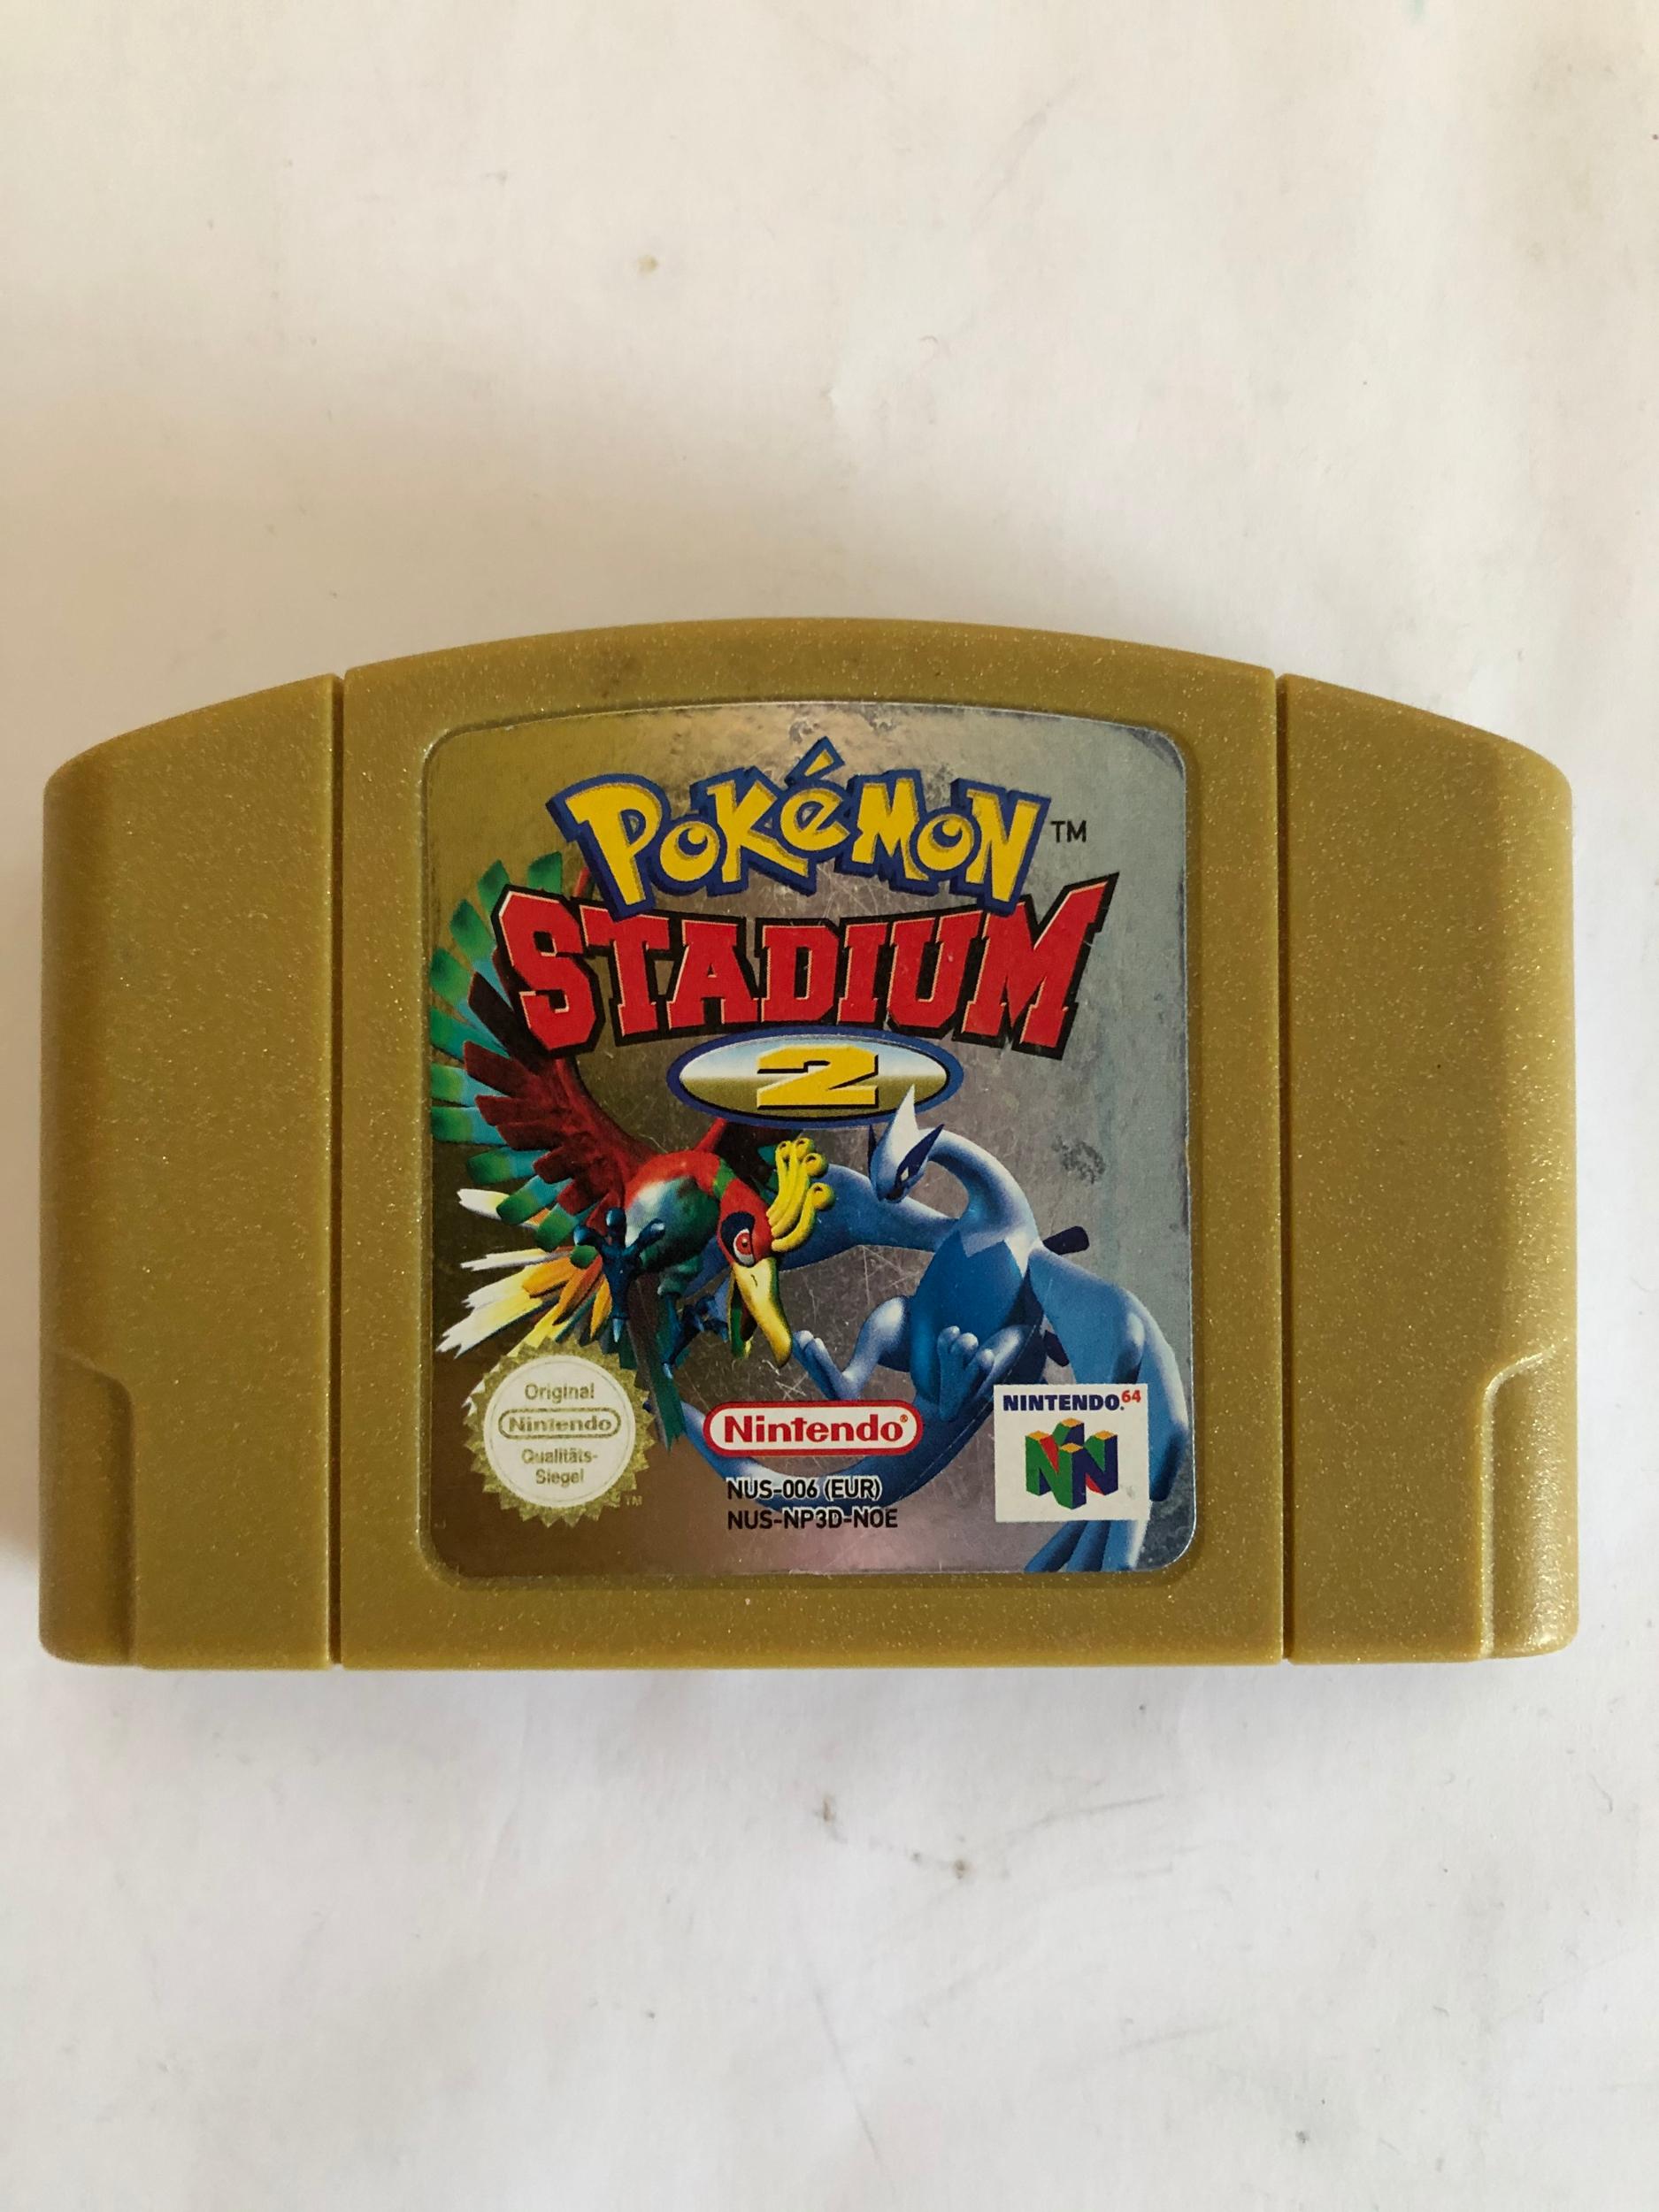 Pokémon Stadium 2